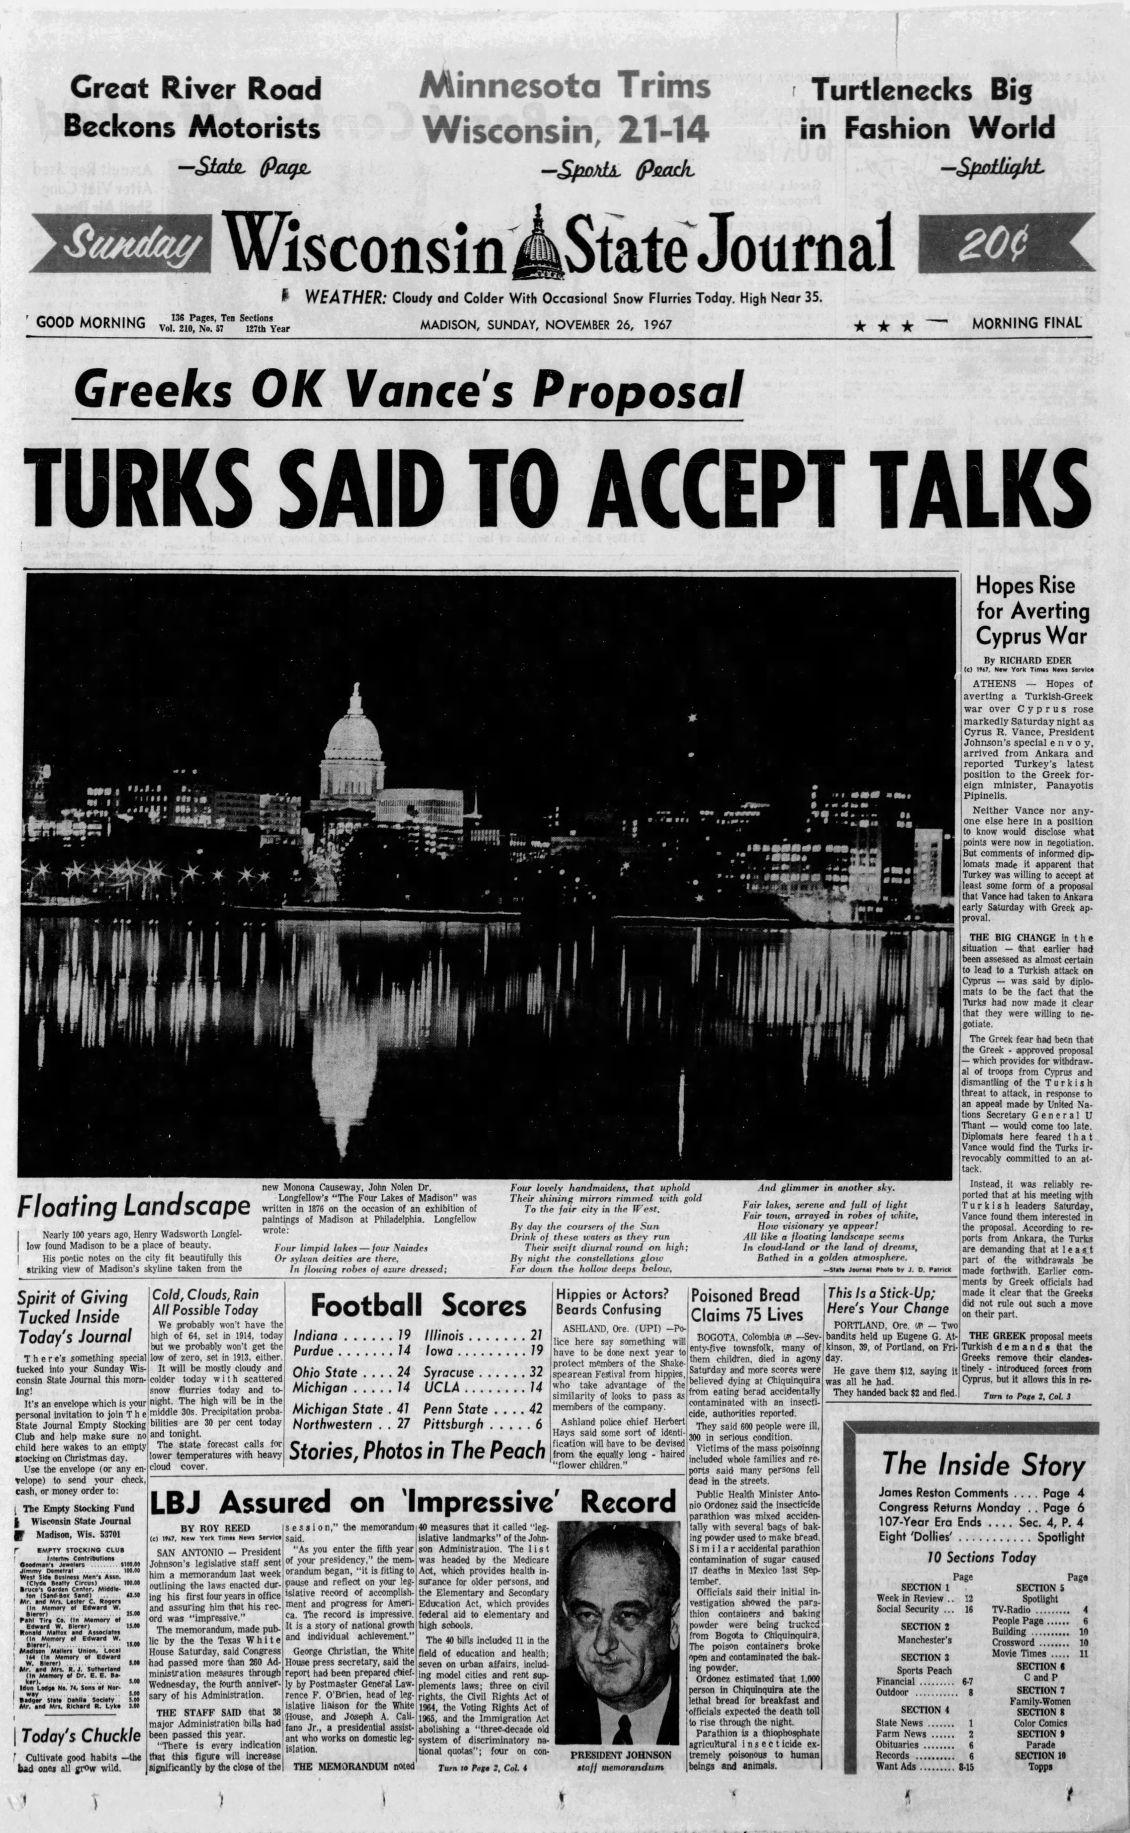 Wisconsin State Journal Nov. 26, 1967